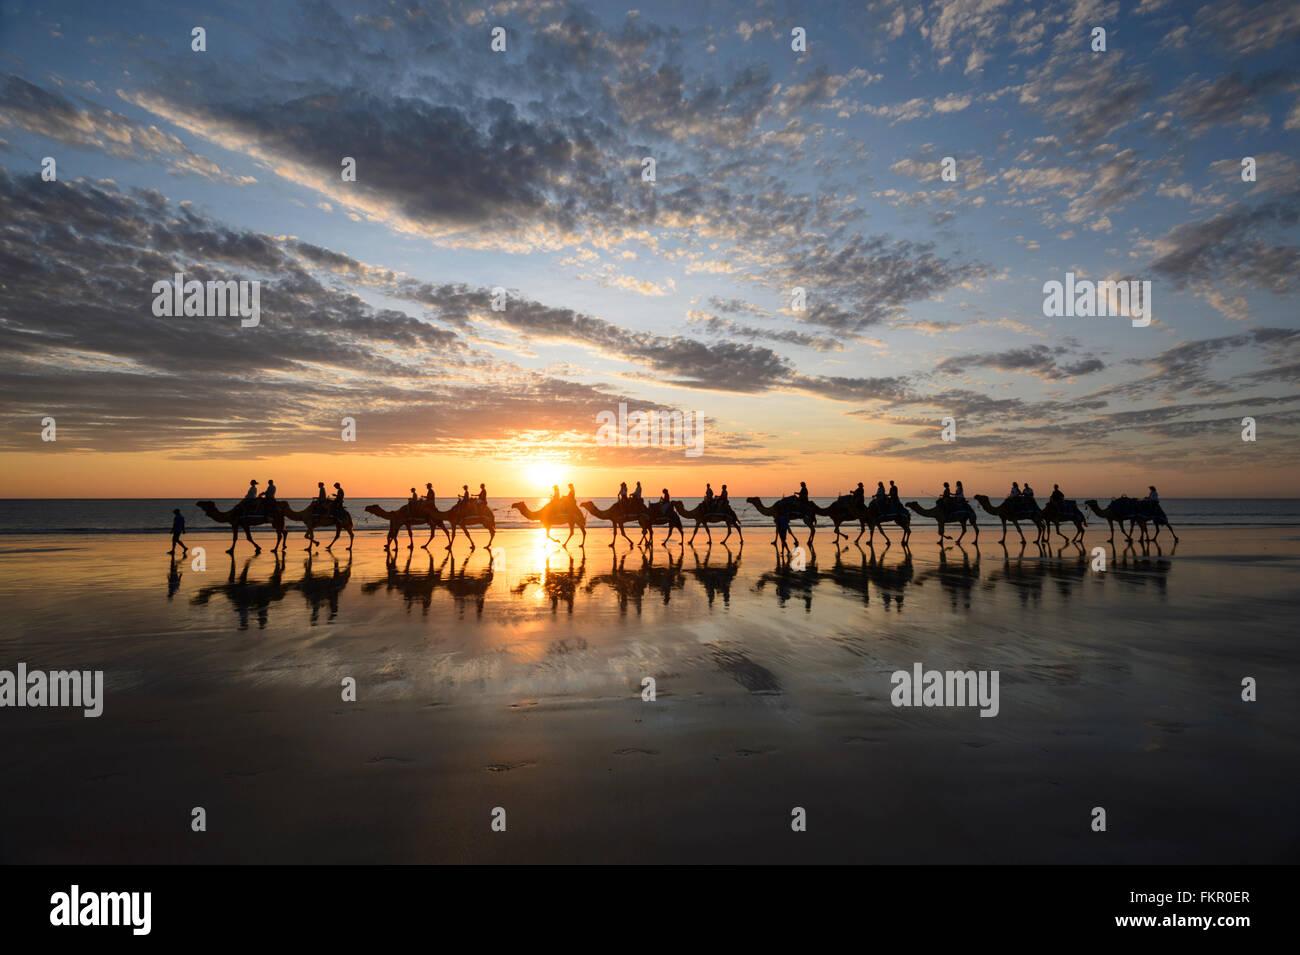 Tourist camel train on Cable Beach at sunset, Broome, Kimberley Region, Western Australia, WA, Australia - Stock Image